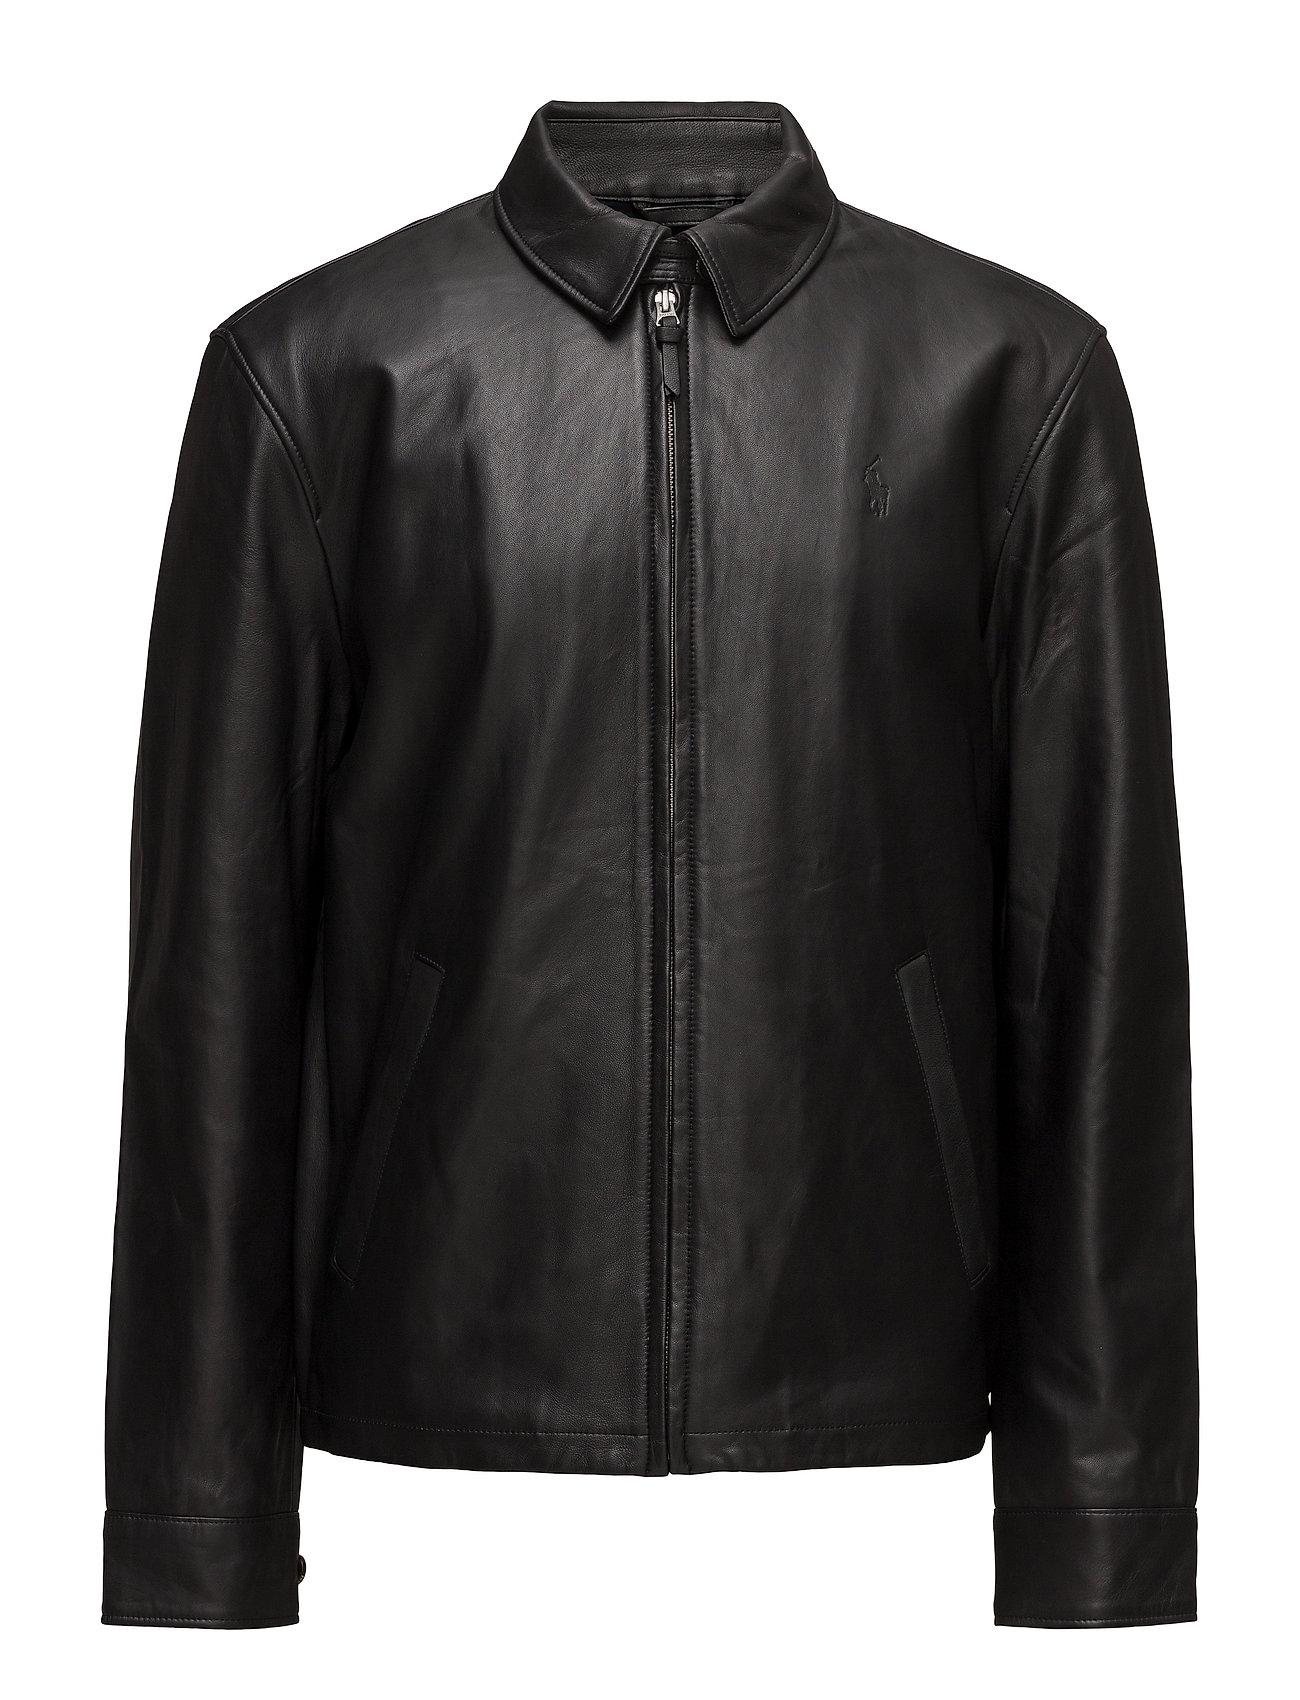 Lambskin Leather Jacket (Polo Black) (£649) - Polo Ralph Lauren ...